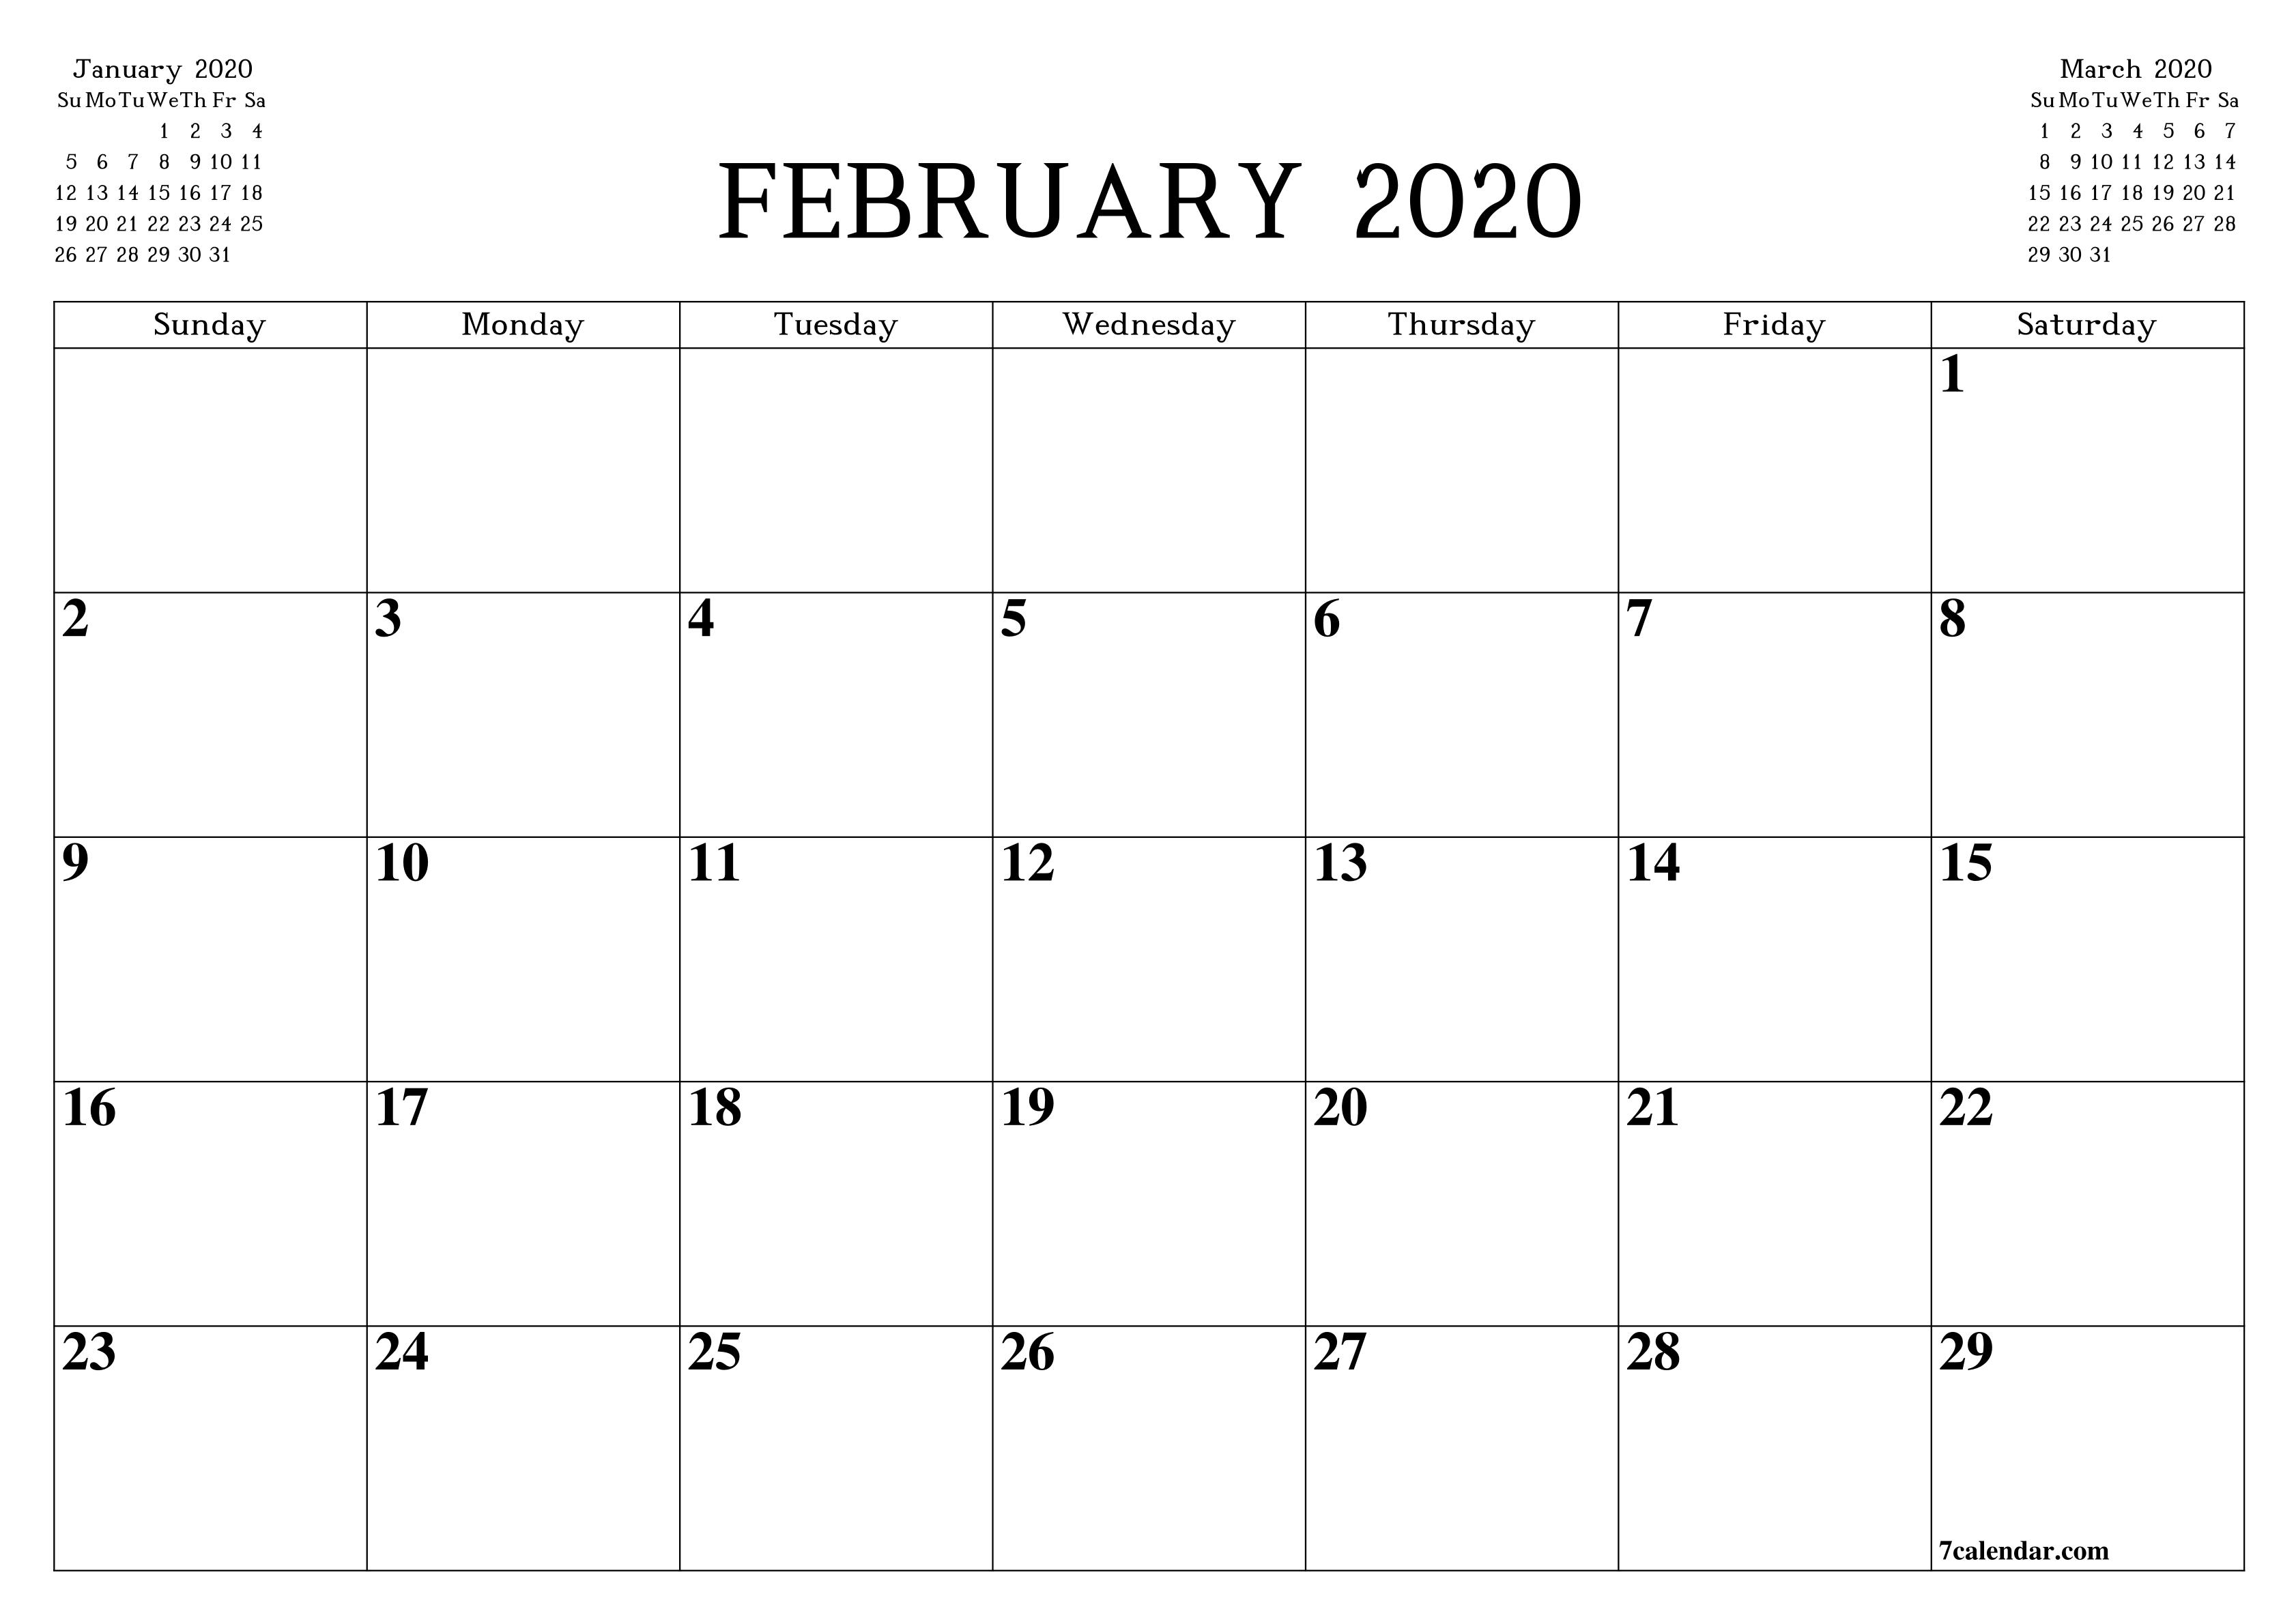 Printable Blank Calendar Planner A4 A5 And A3 Pdf And Png February 2020 7calendar Com Calendar Printables Print Calendar Calendar